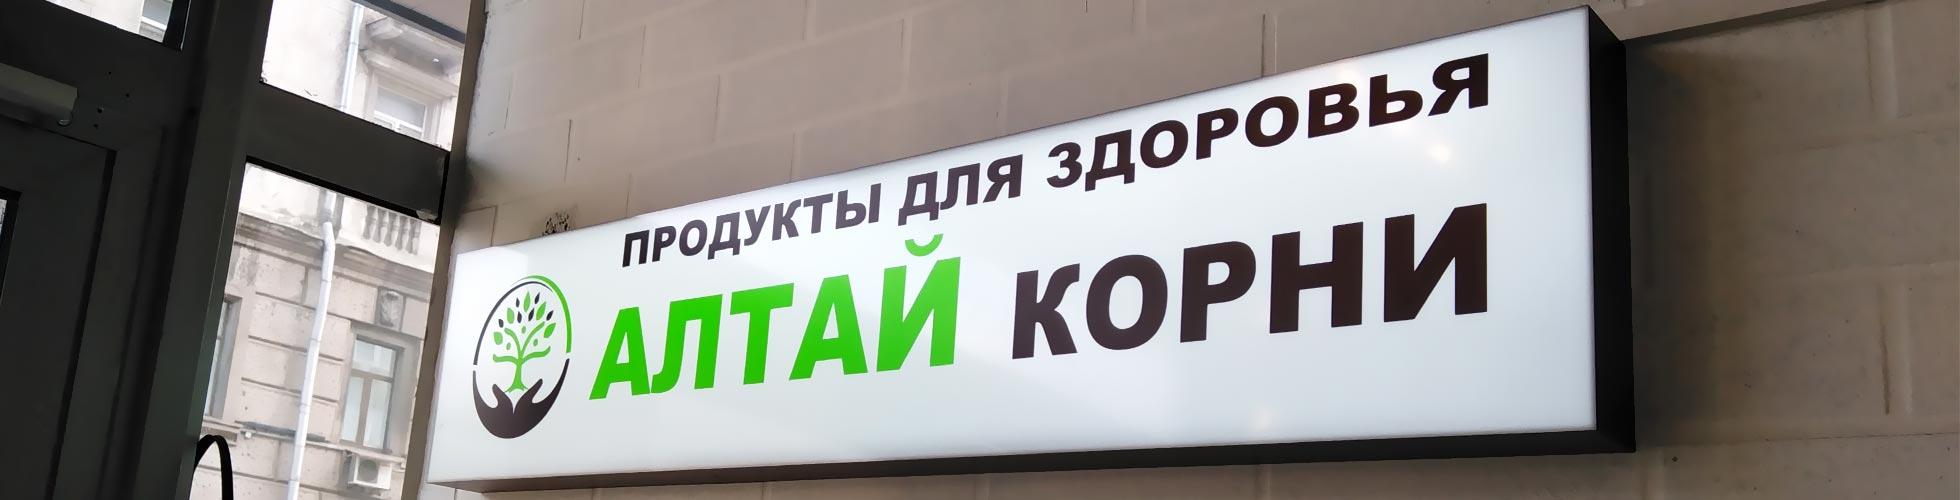 altay-korni